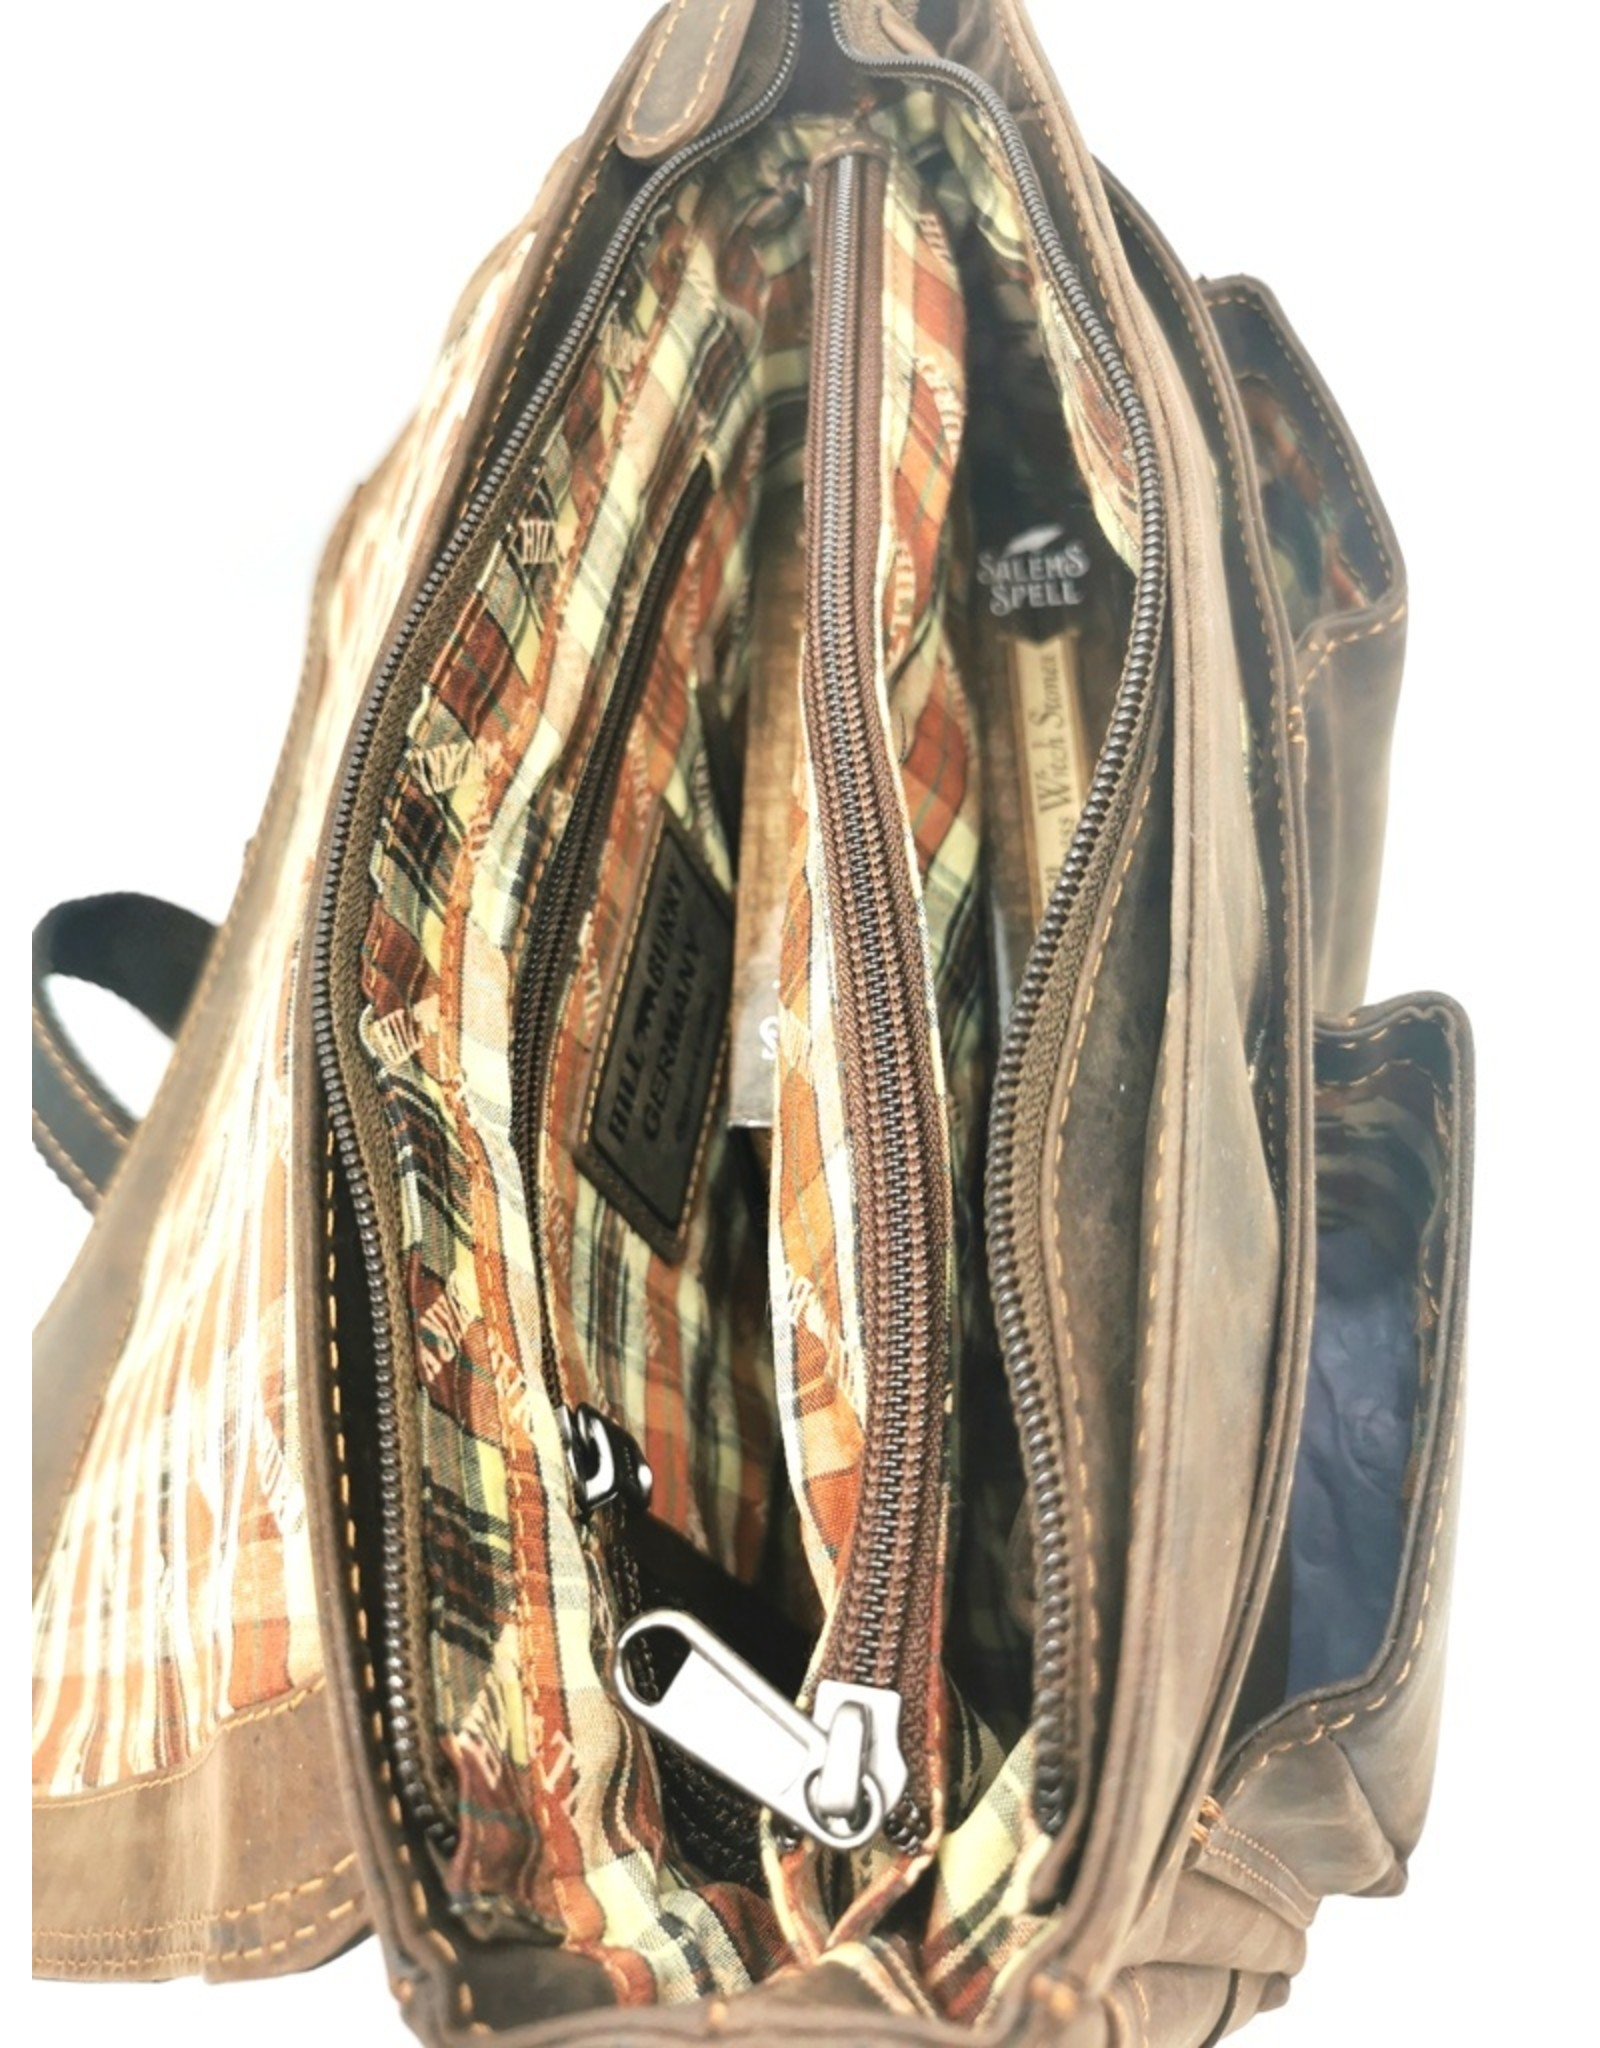 HillBurry Leren Schoudertassen Leren Crossbody tassen - HillBurry Leren messenger tas met holster omslag  (medium)